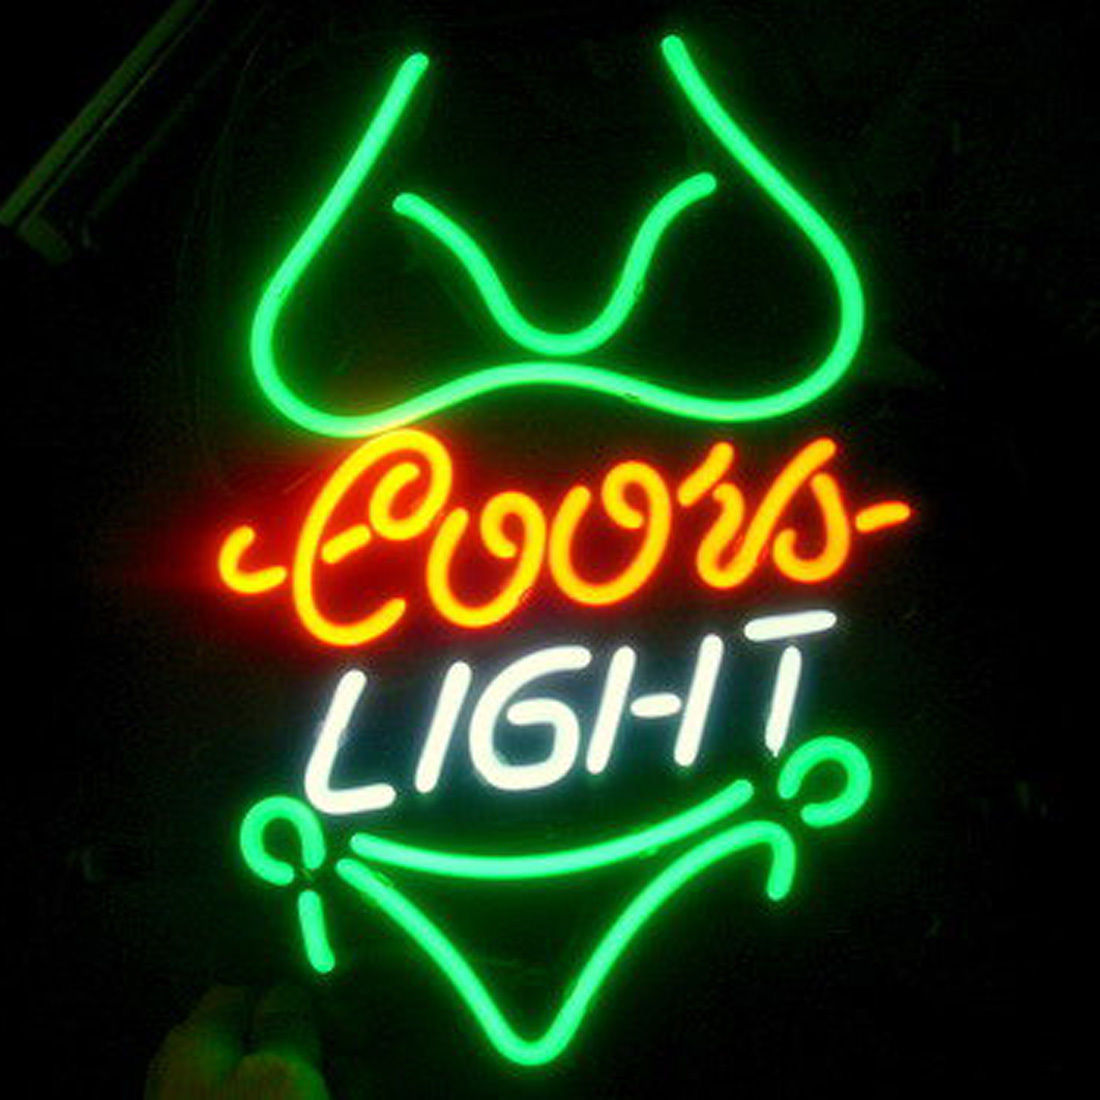 Bikini Coors Light Neon Sign Handcrafted Real Glass Tube